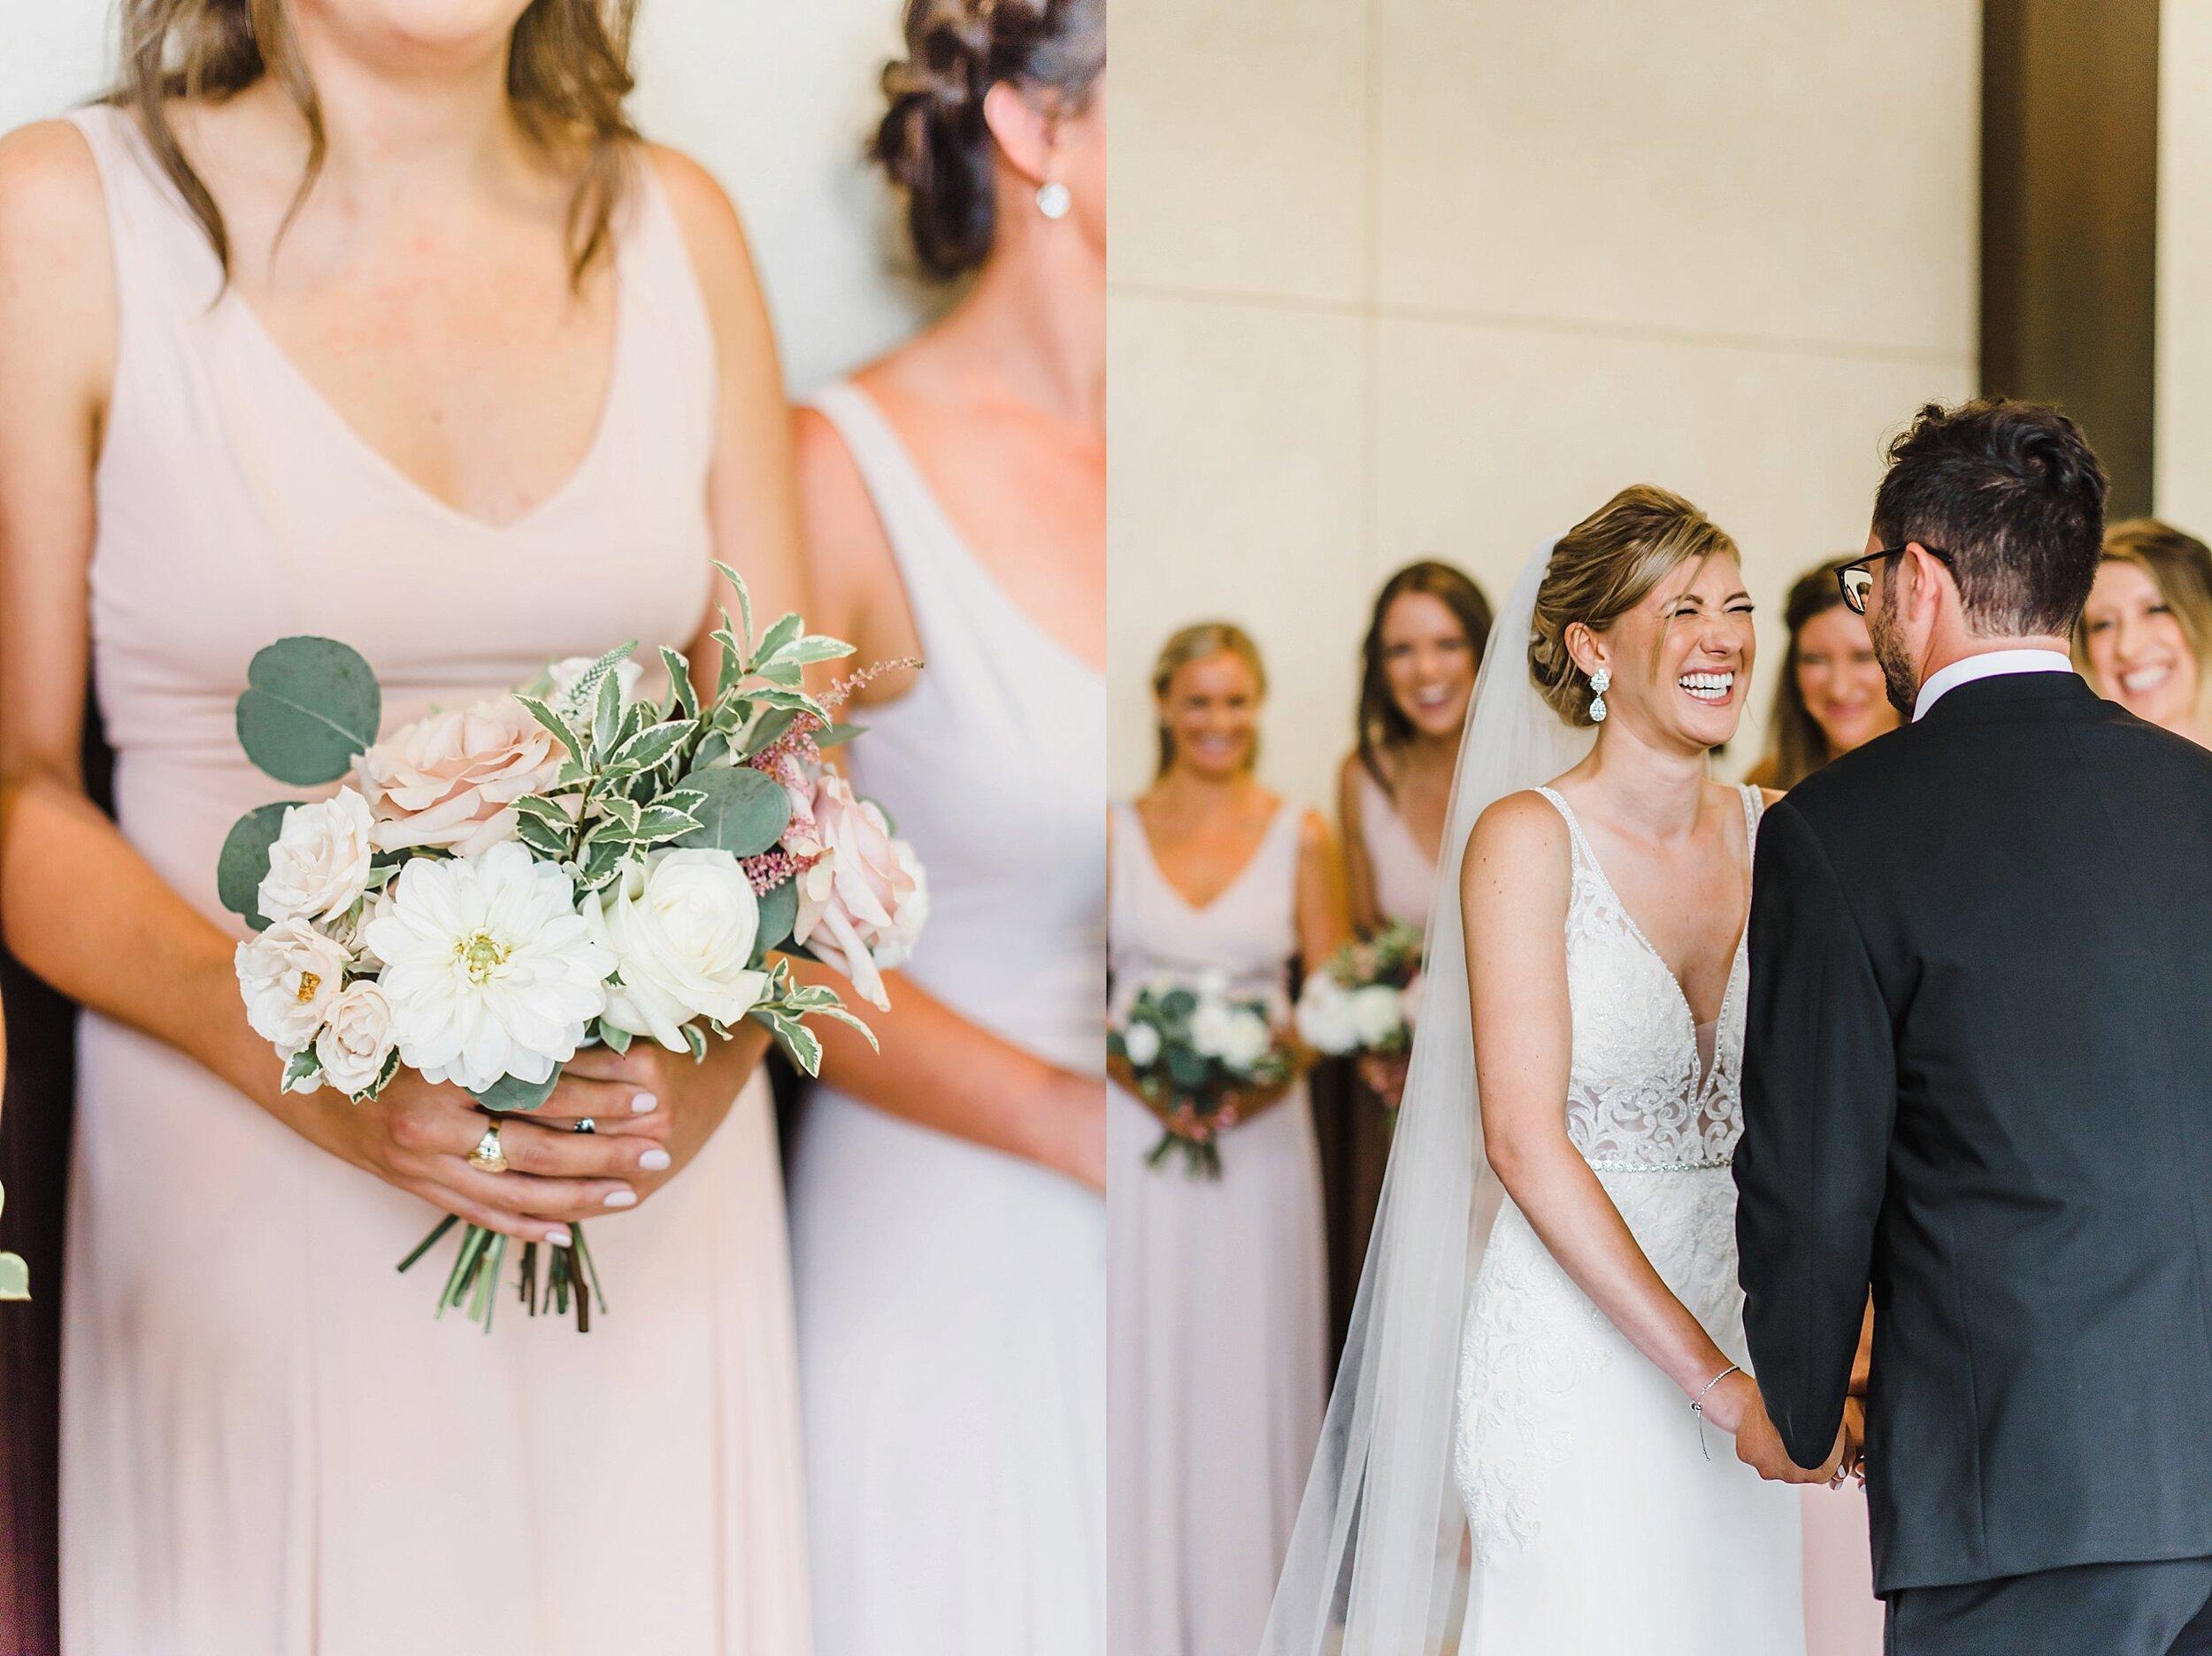 light airy fine art ottawa wedding photographer | Ali and Batoul Photography | Fairmont Le Chateau Montebello35.jpg